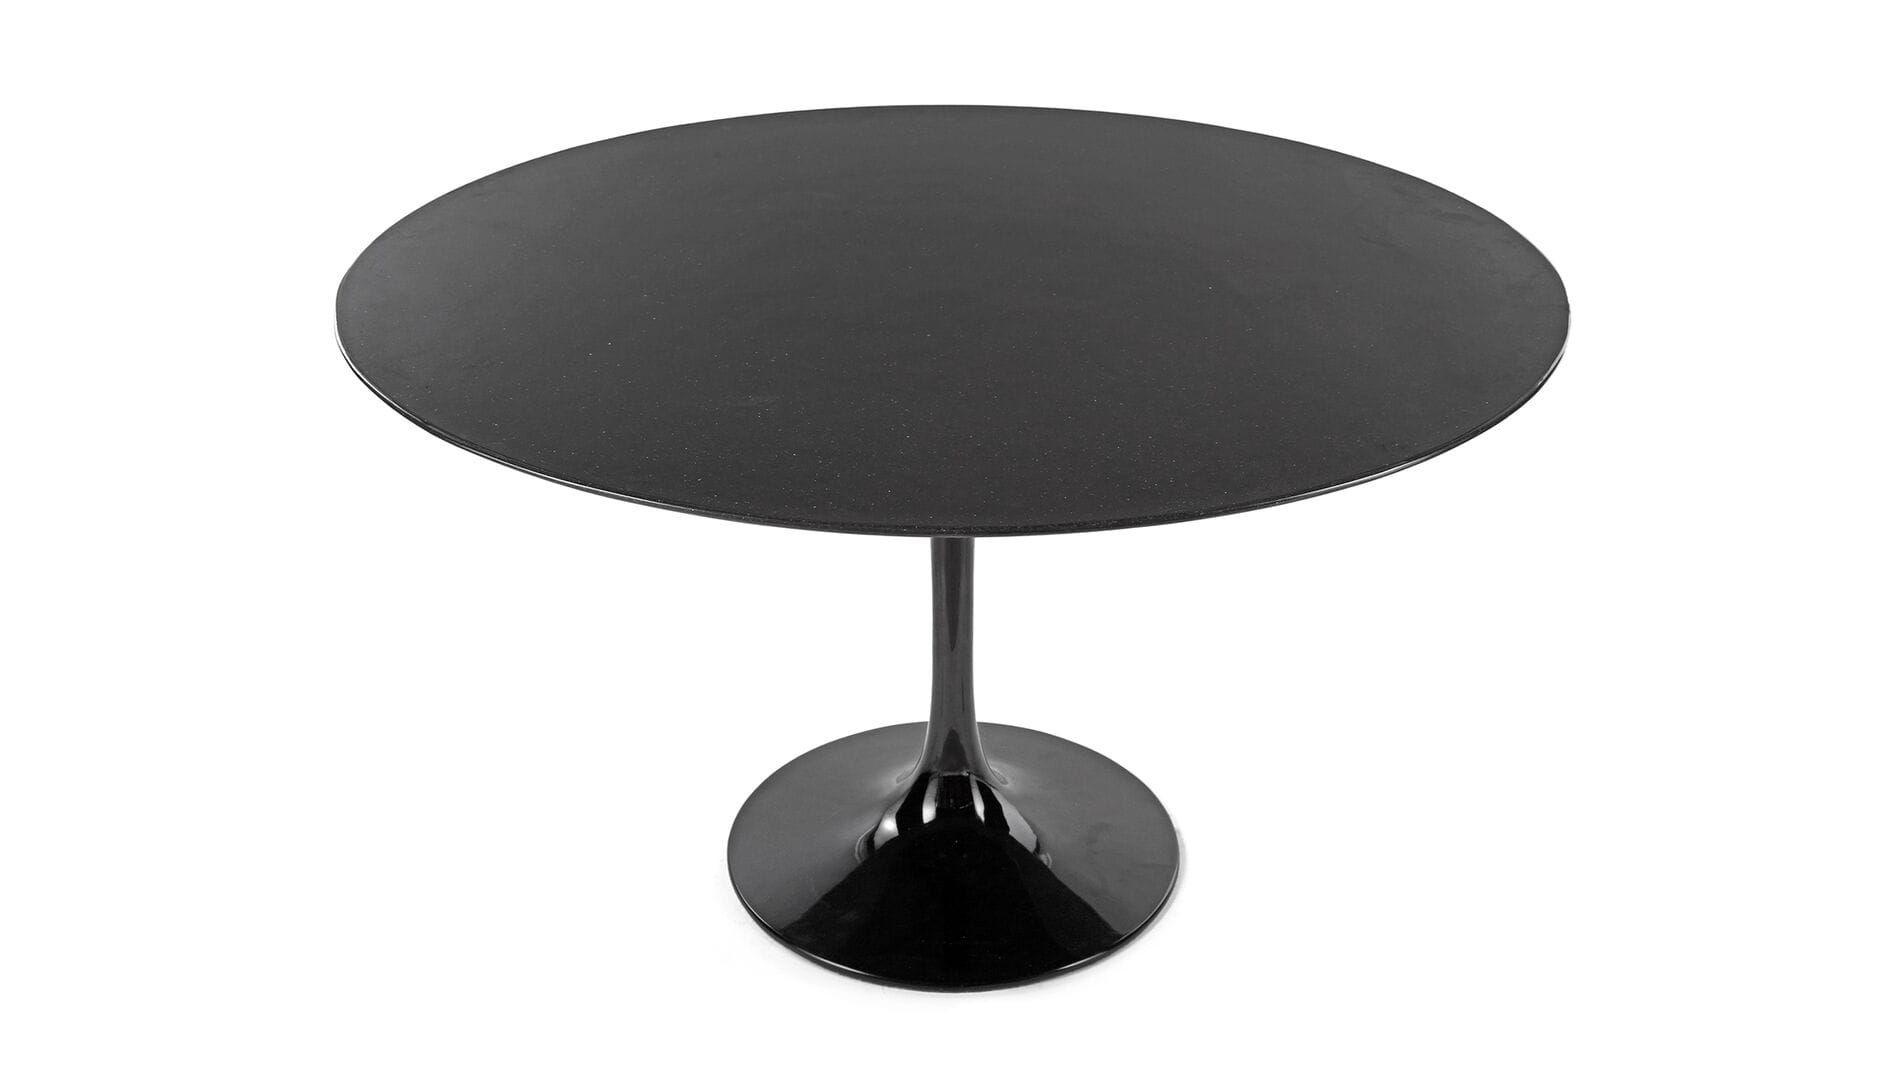 Стол обеденный Tulip Stone диаметр 122